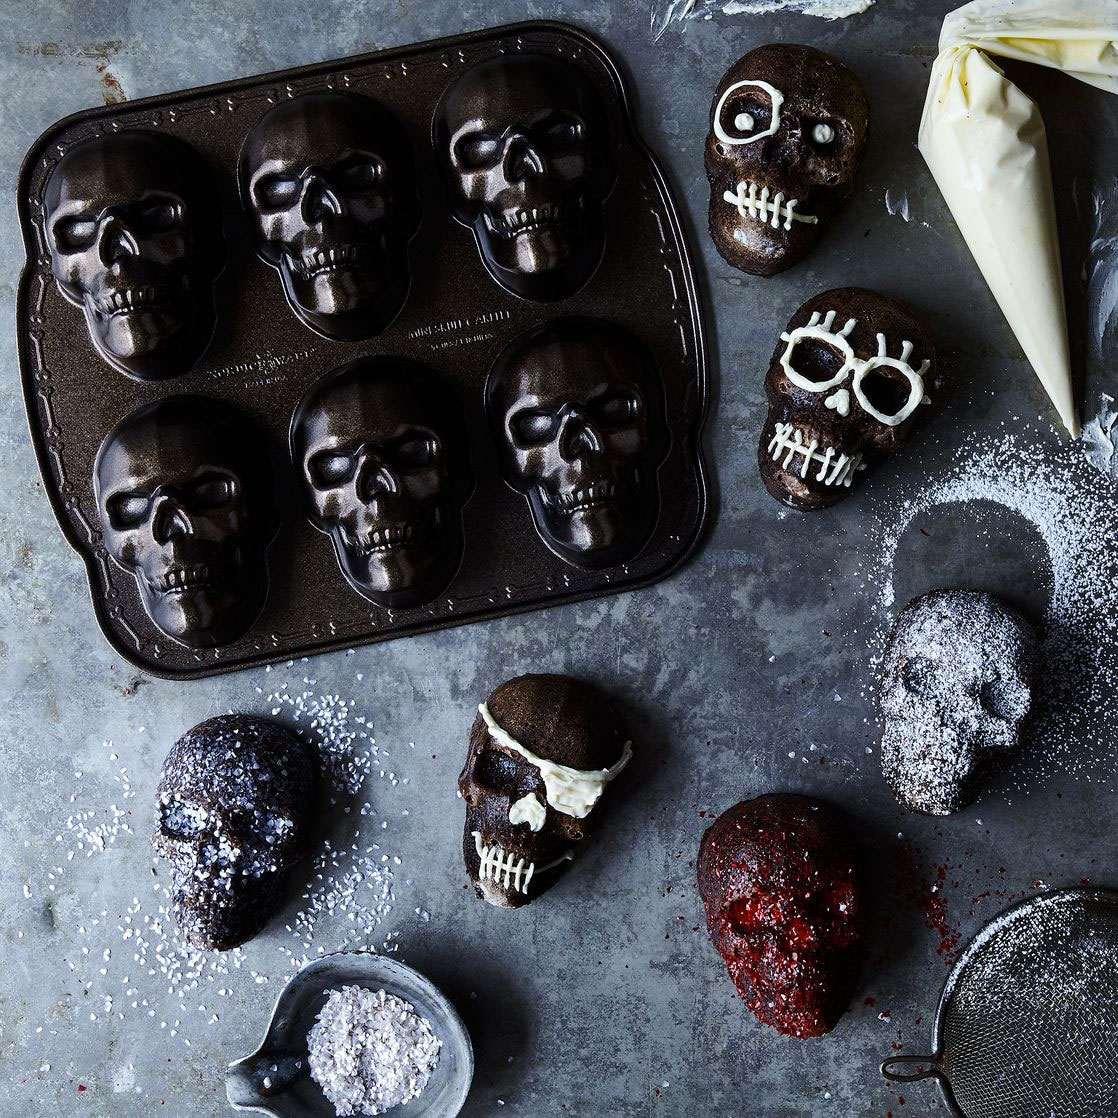 Haunted Skull Cakelet Pan Dudeiwantthat Com